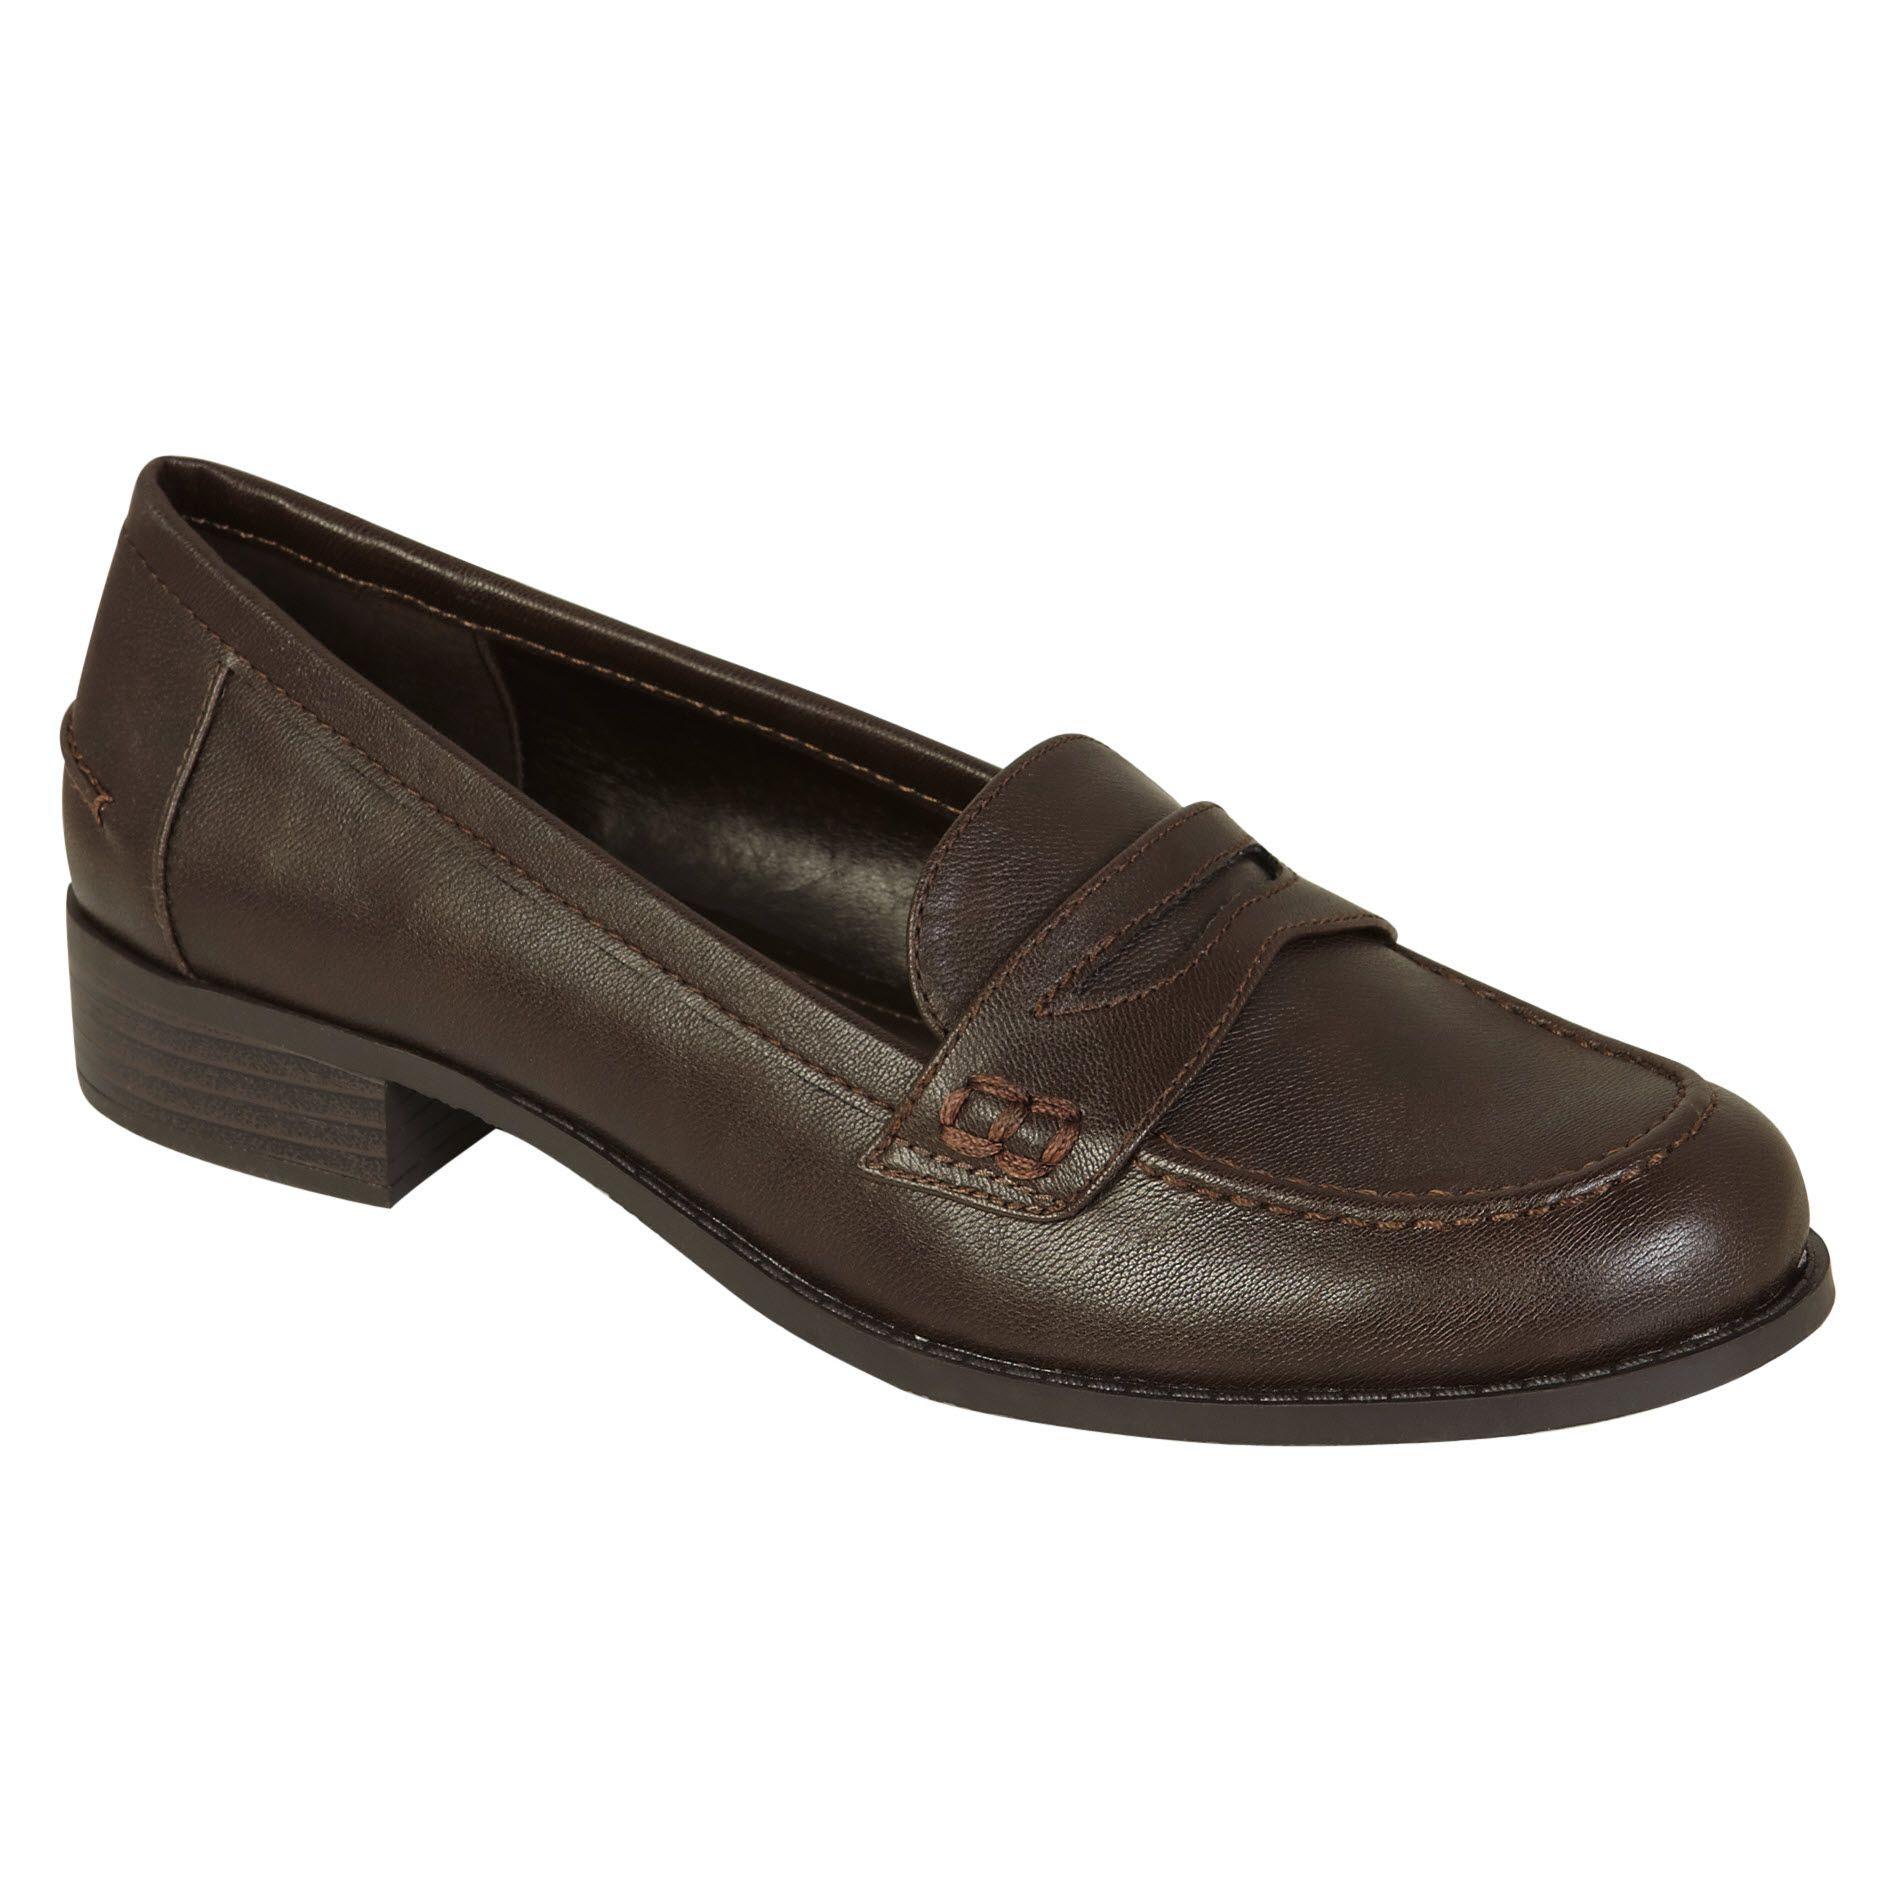 Laura Scott Women's Casual Loafer Dani - Brown - Shoes ...